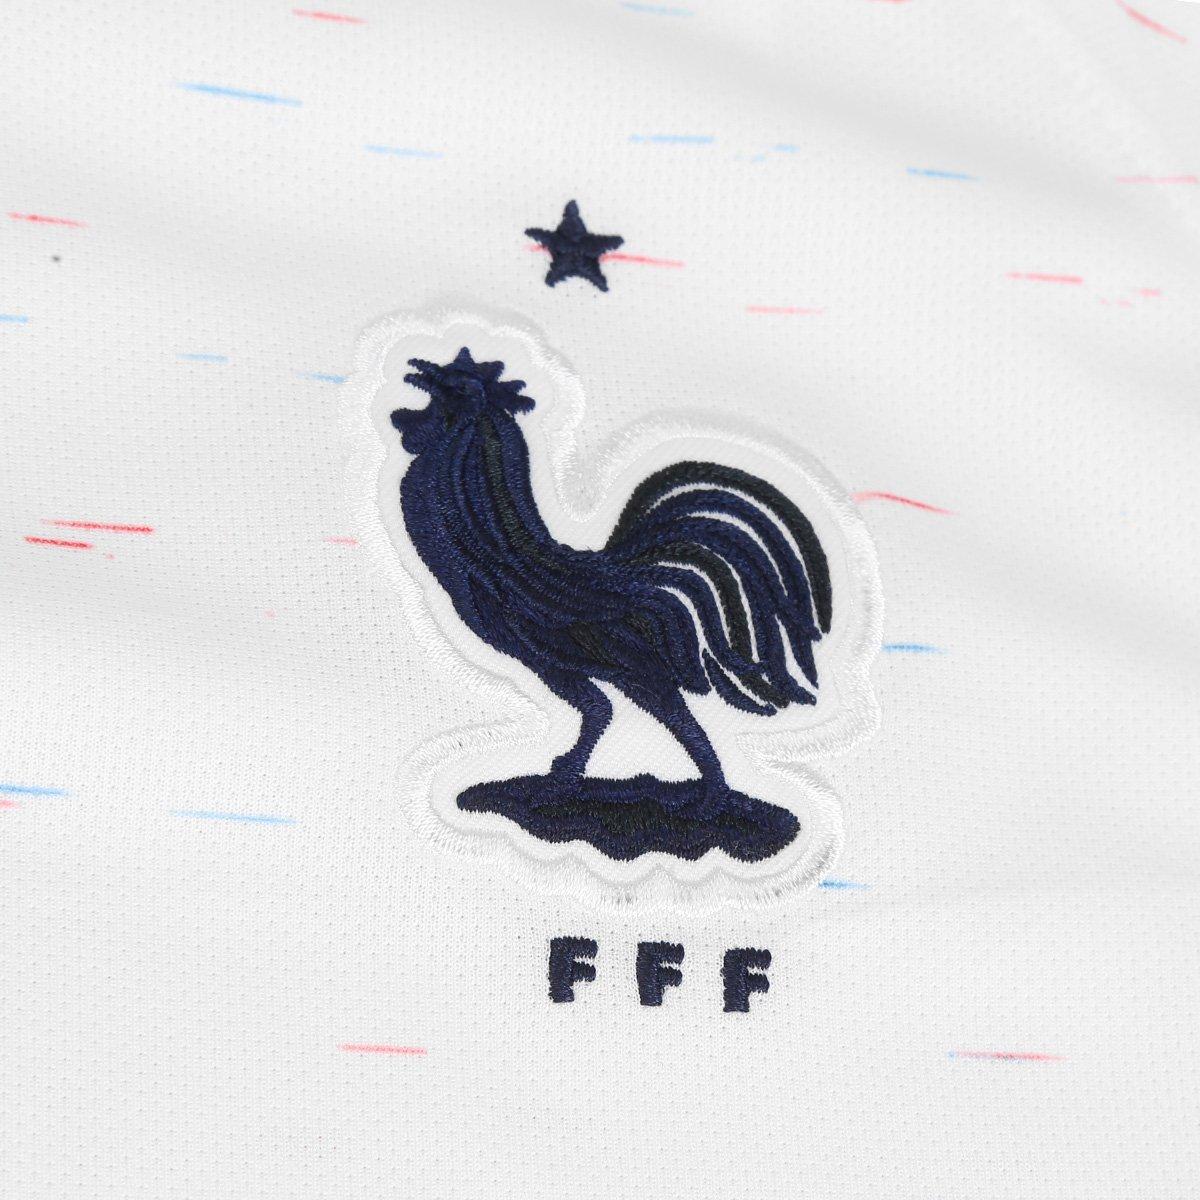 ... Camisa Seleção França Juvenil Away 2018 s n° - Torcedor Nike ... 90b08befd0d07